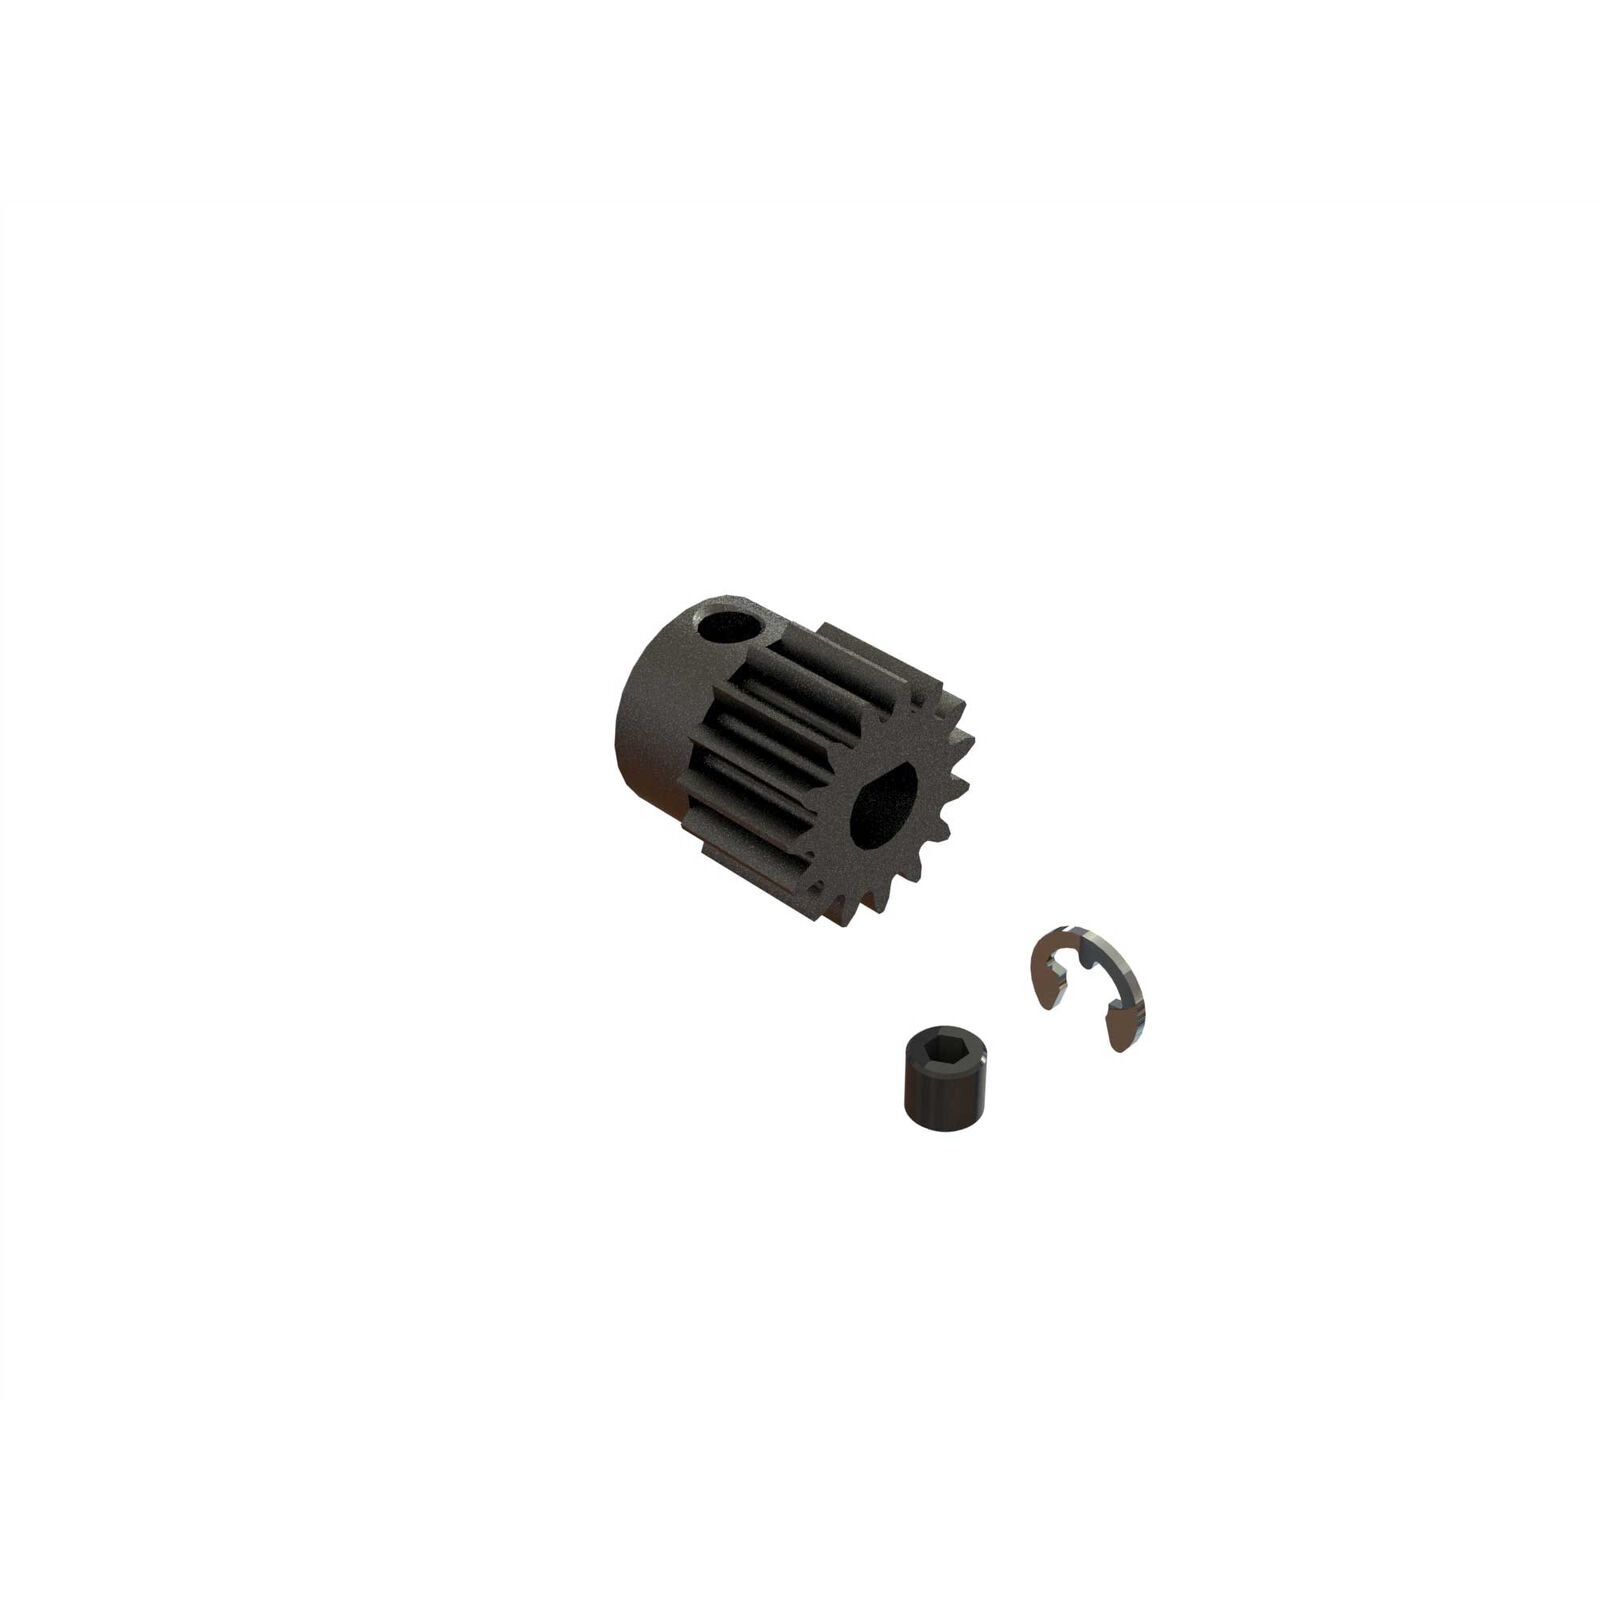 15T 0.8Mod Safe-D5 Pinion Gear